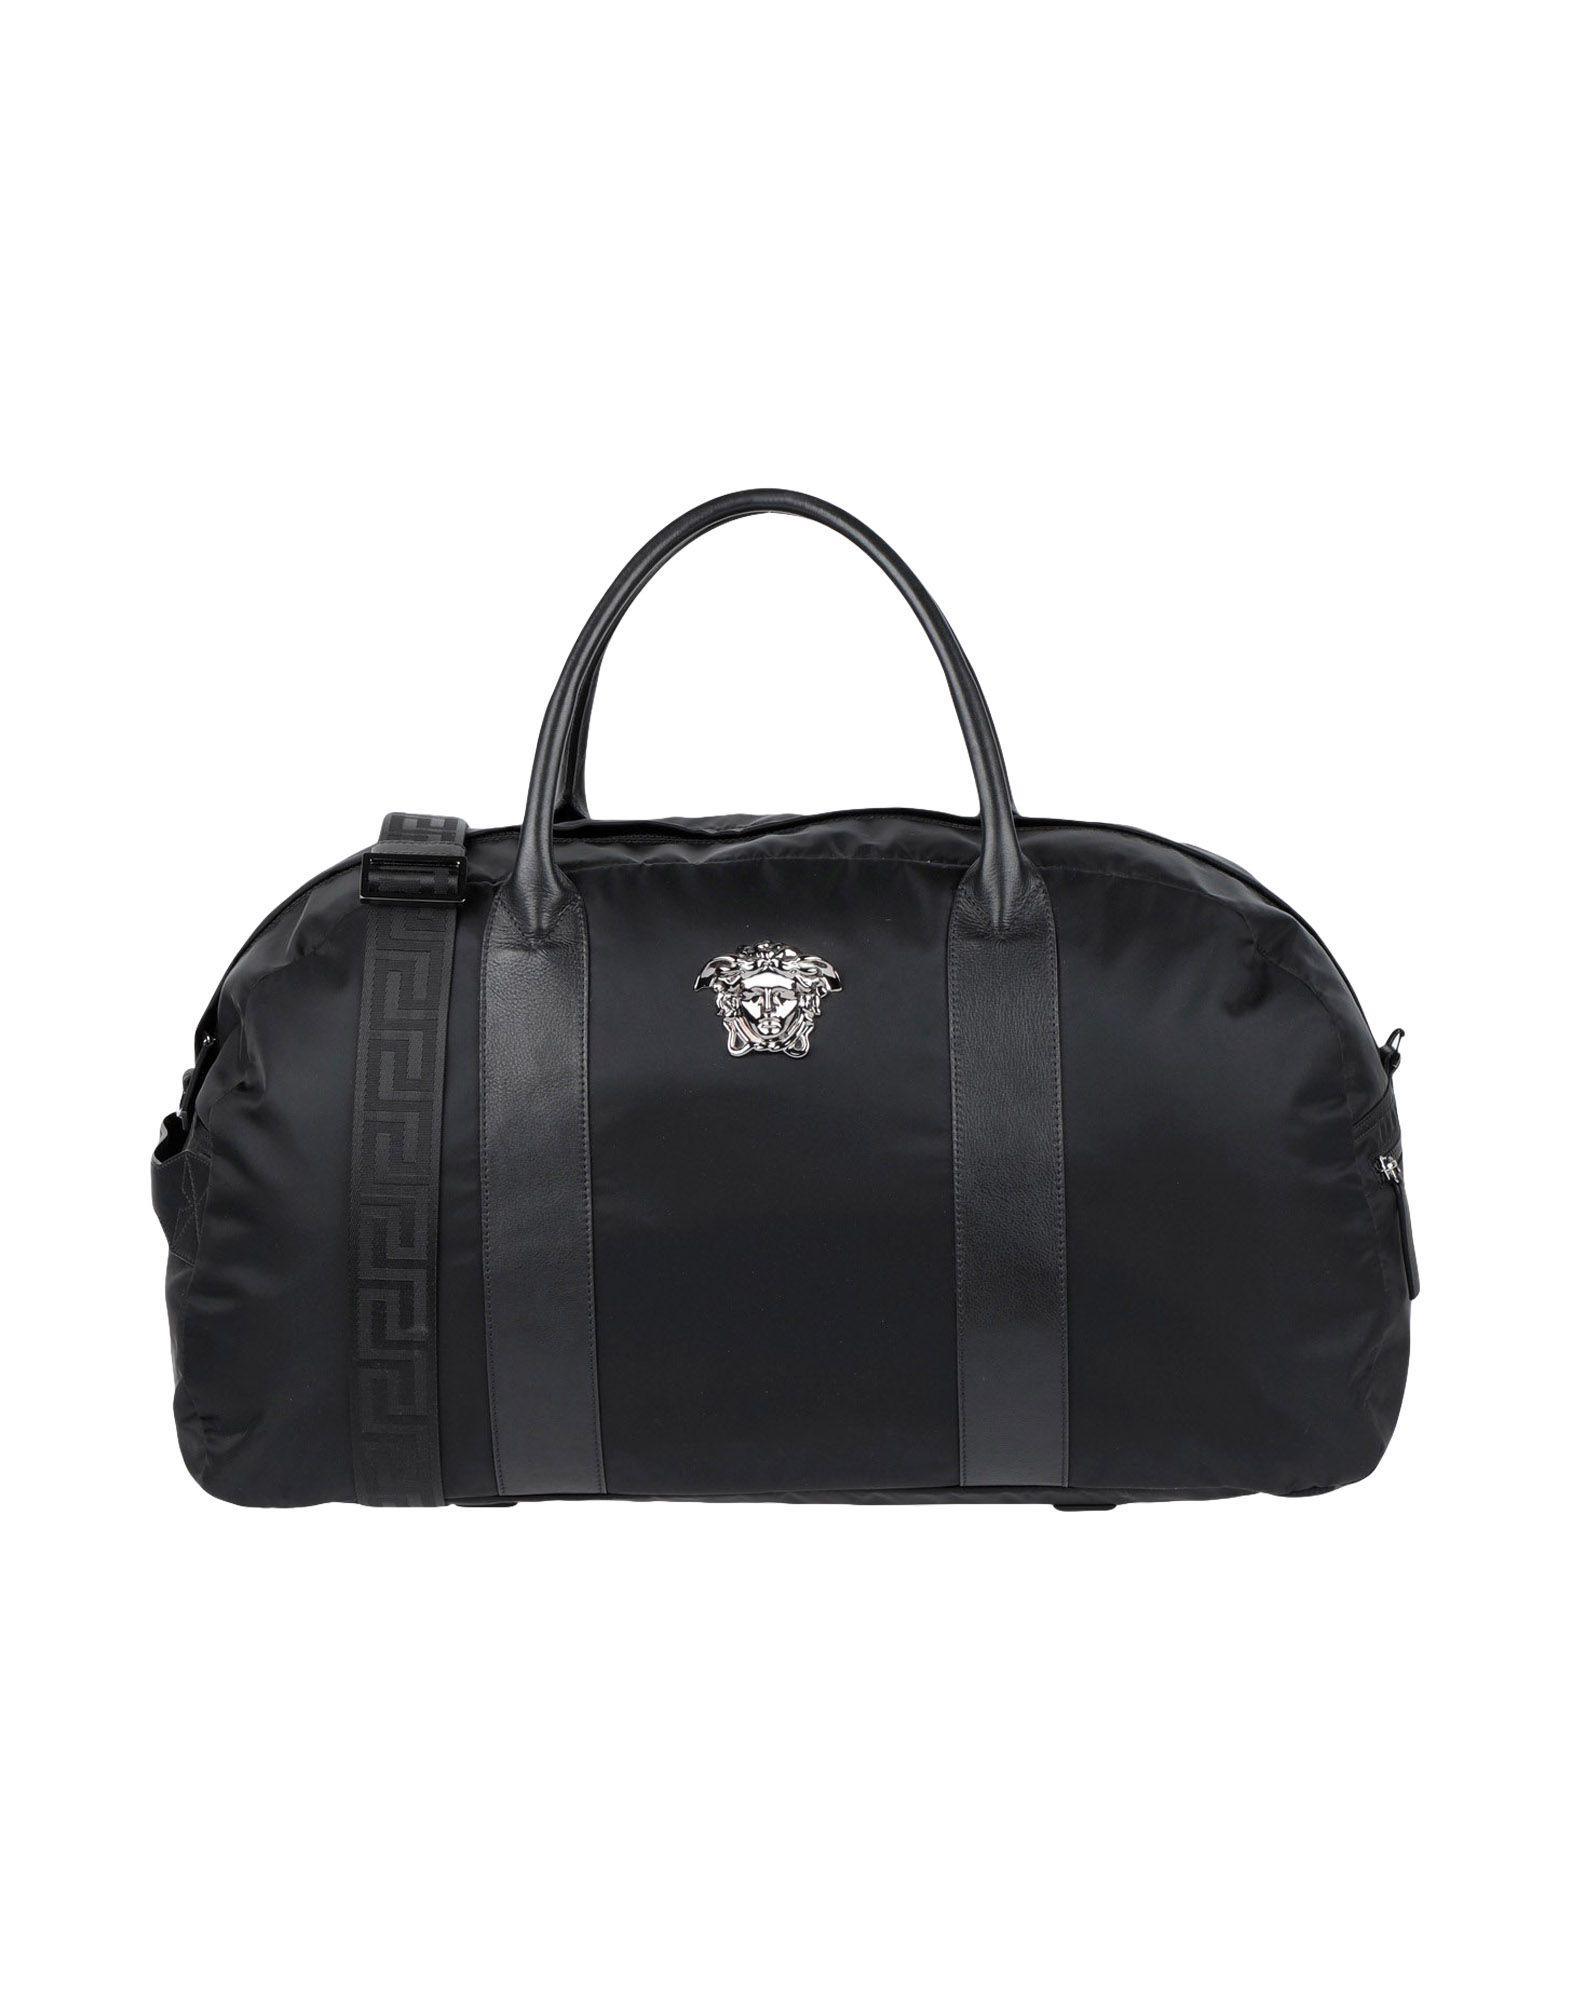 776ad5fb7f Lyst - Versace Travel   Duffel Bag in Black